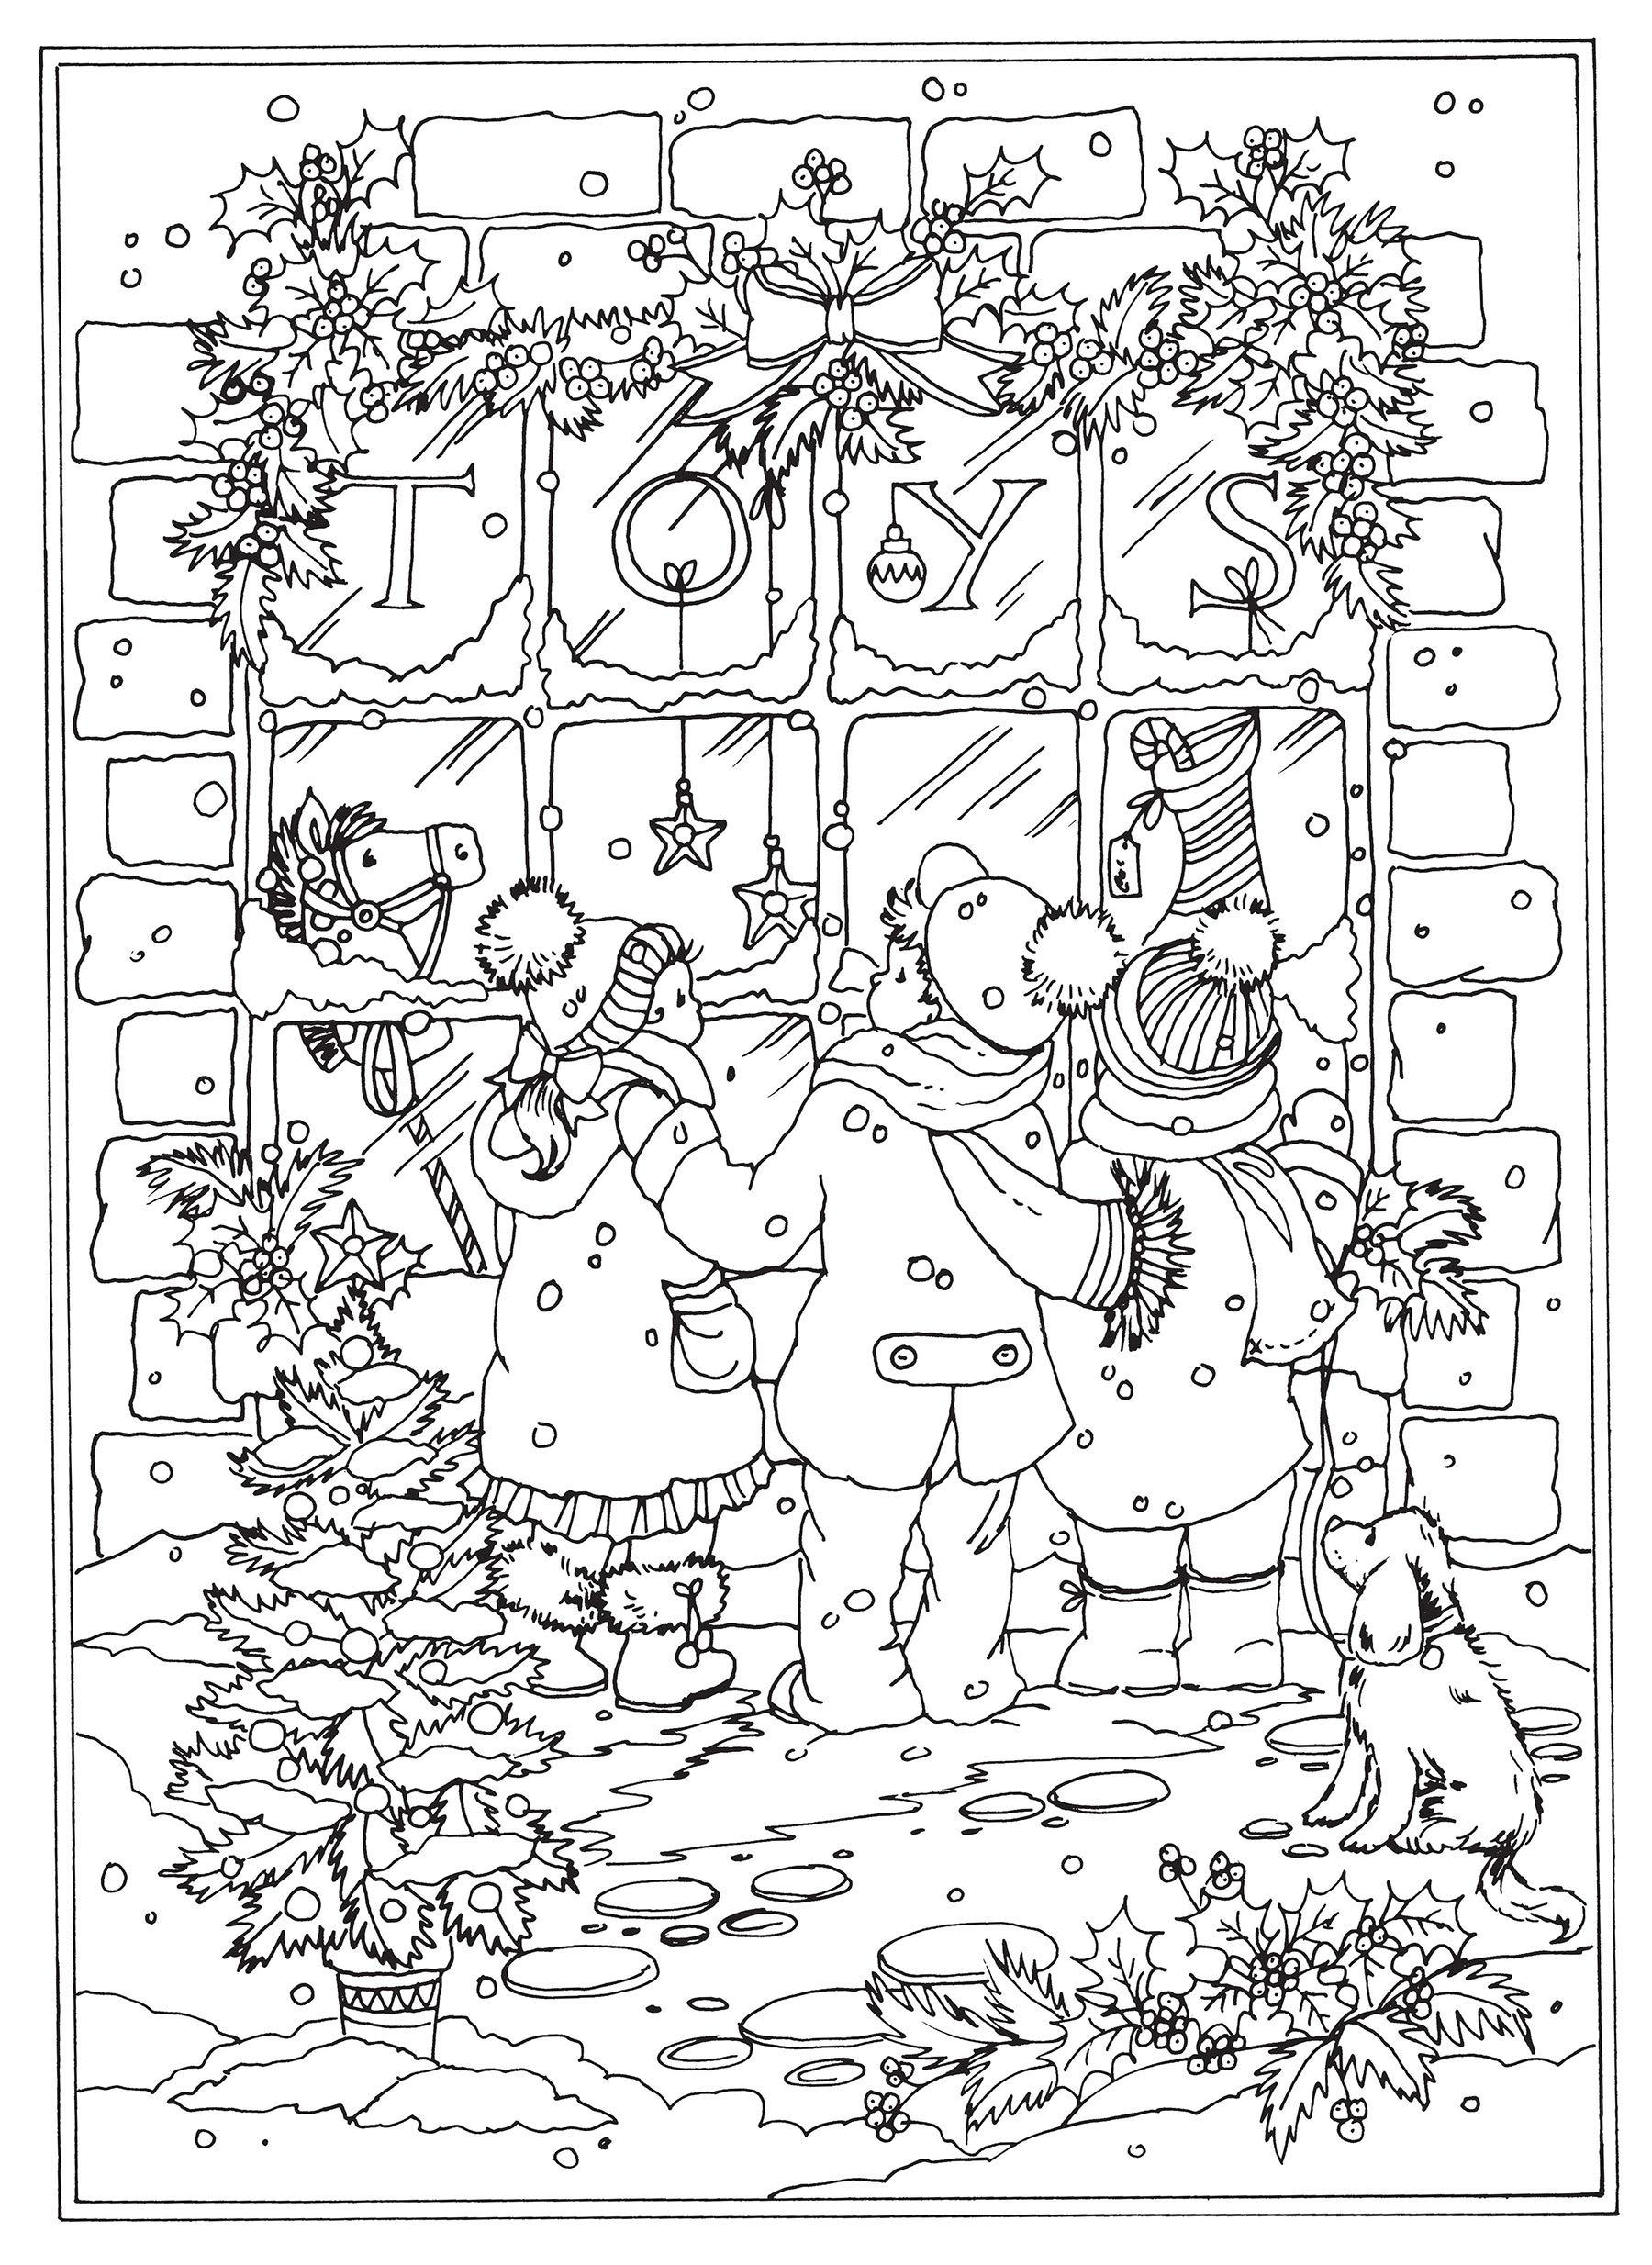 Amazon Com Creative Haven Winter Wonderland Coloring Book Adult Coloring 9780486805016 Goodridge Teresa Books